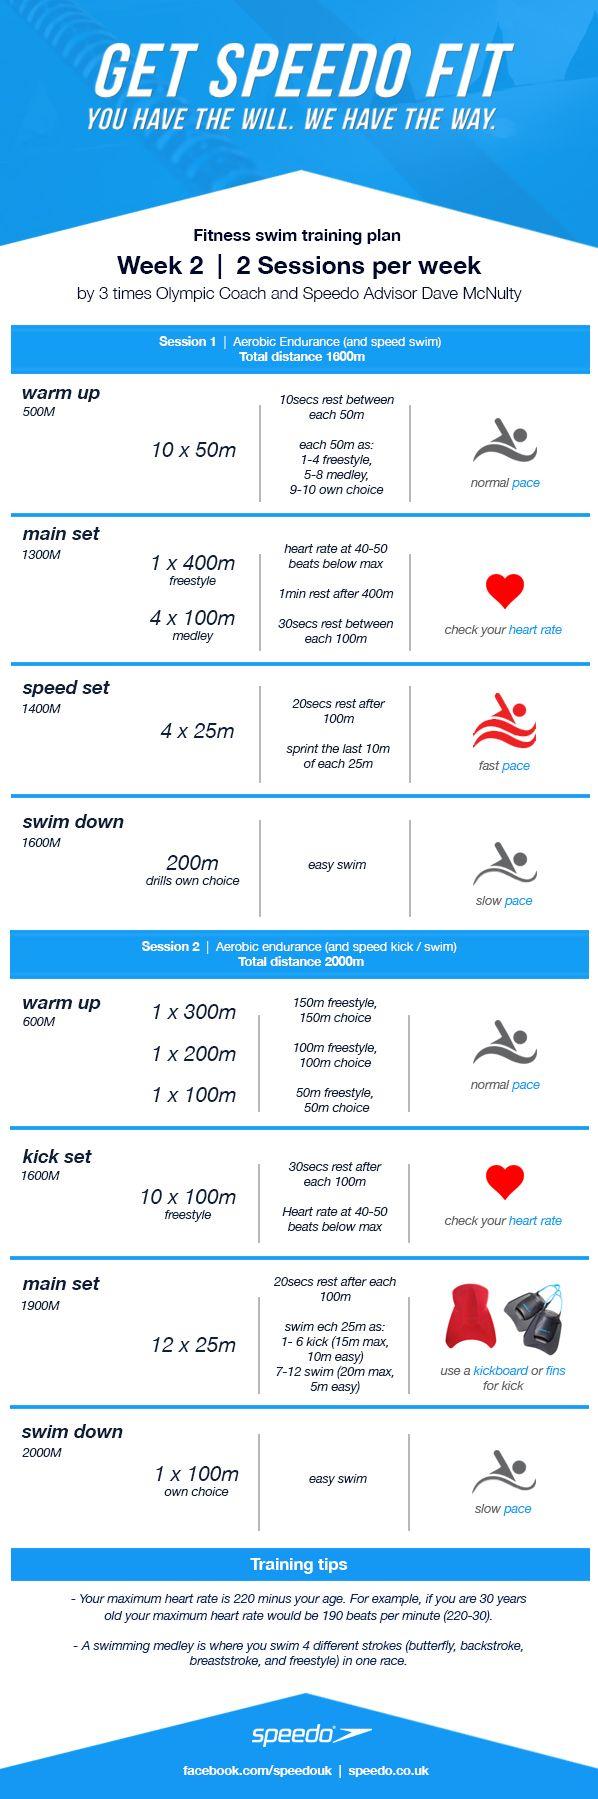 Dave McNulty Swim Fitness Training Plan - Week 2 | Speedo